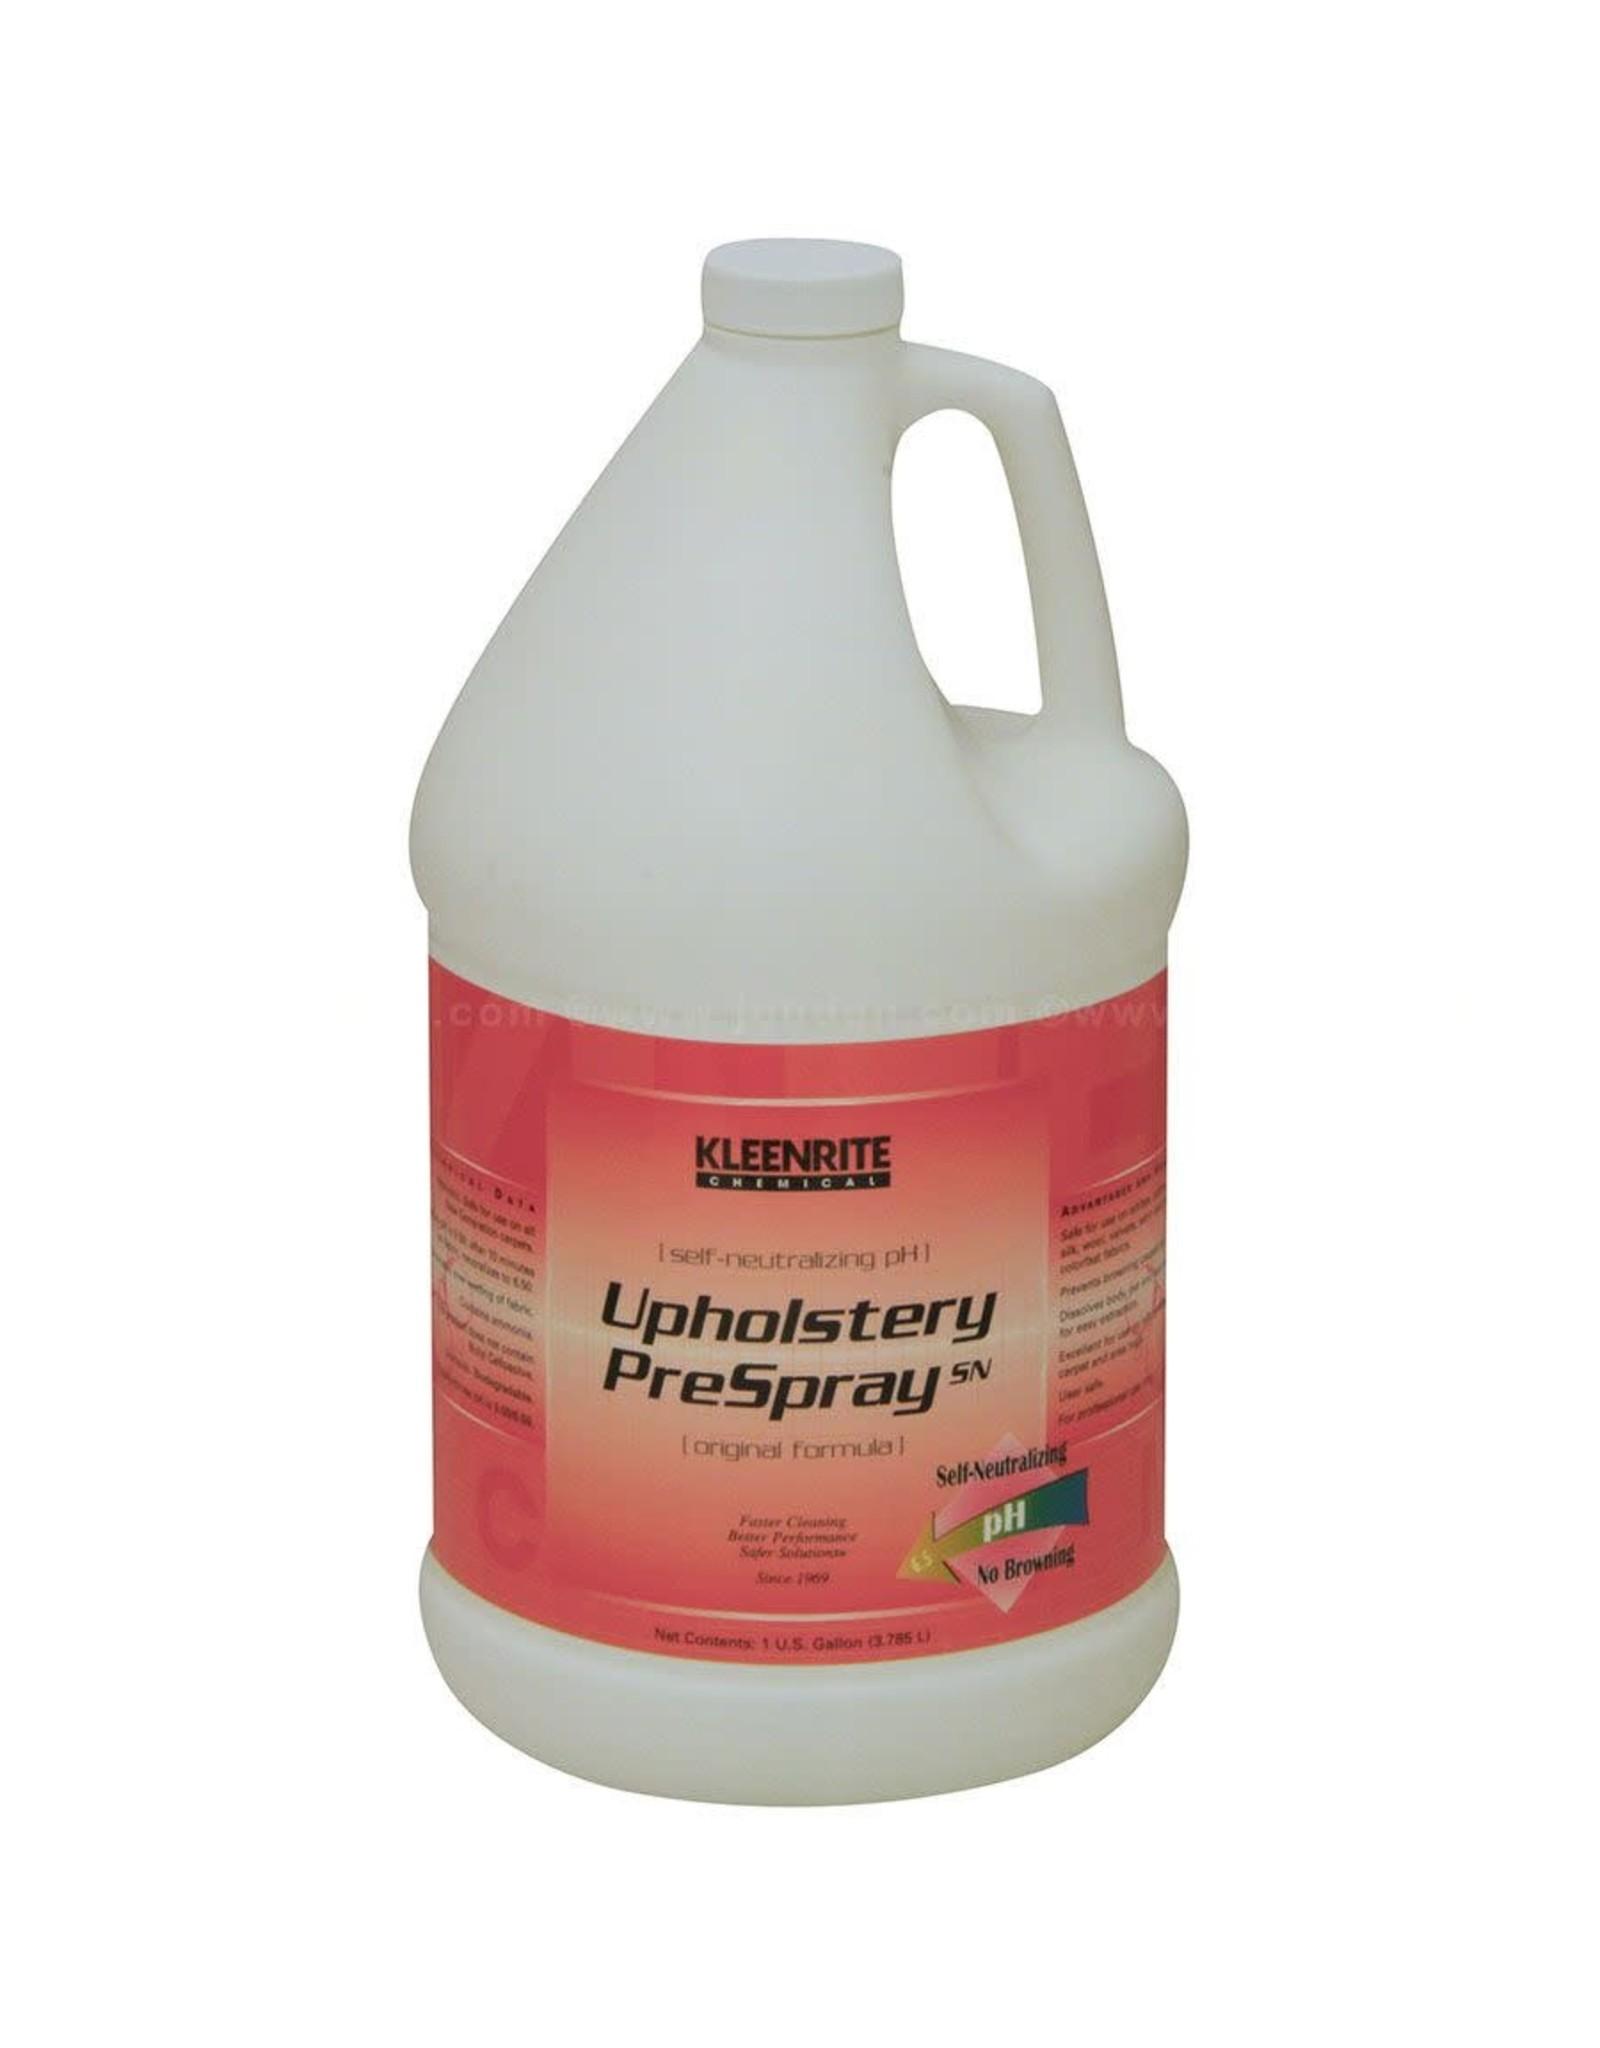 Kleenrite Upholstery Prespray SN